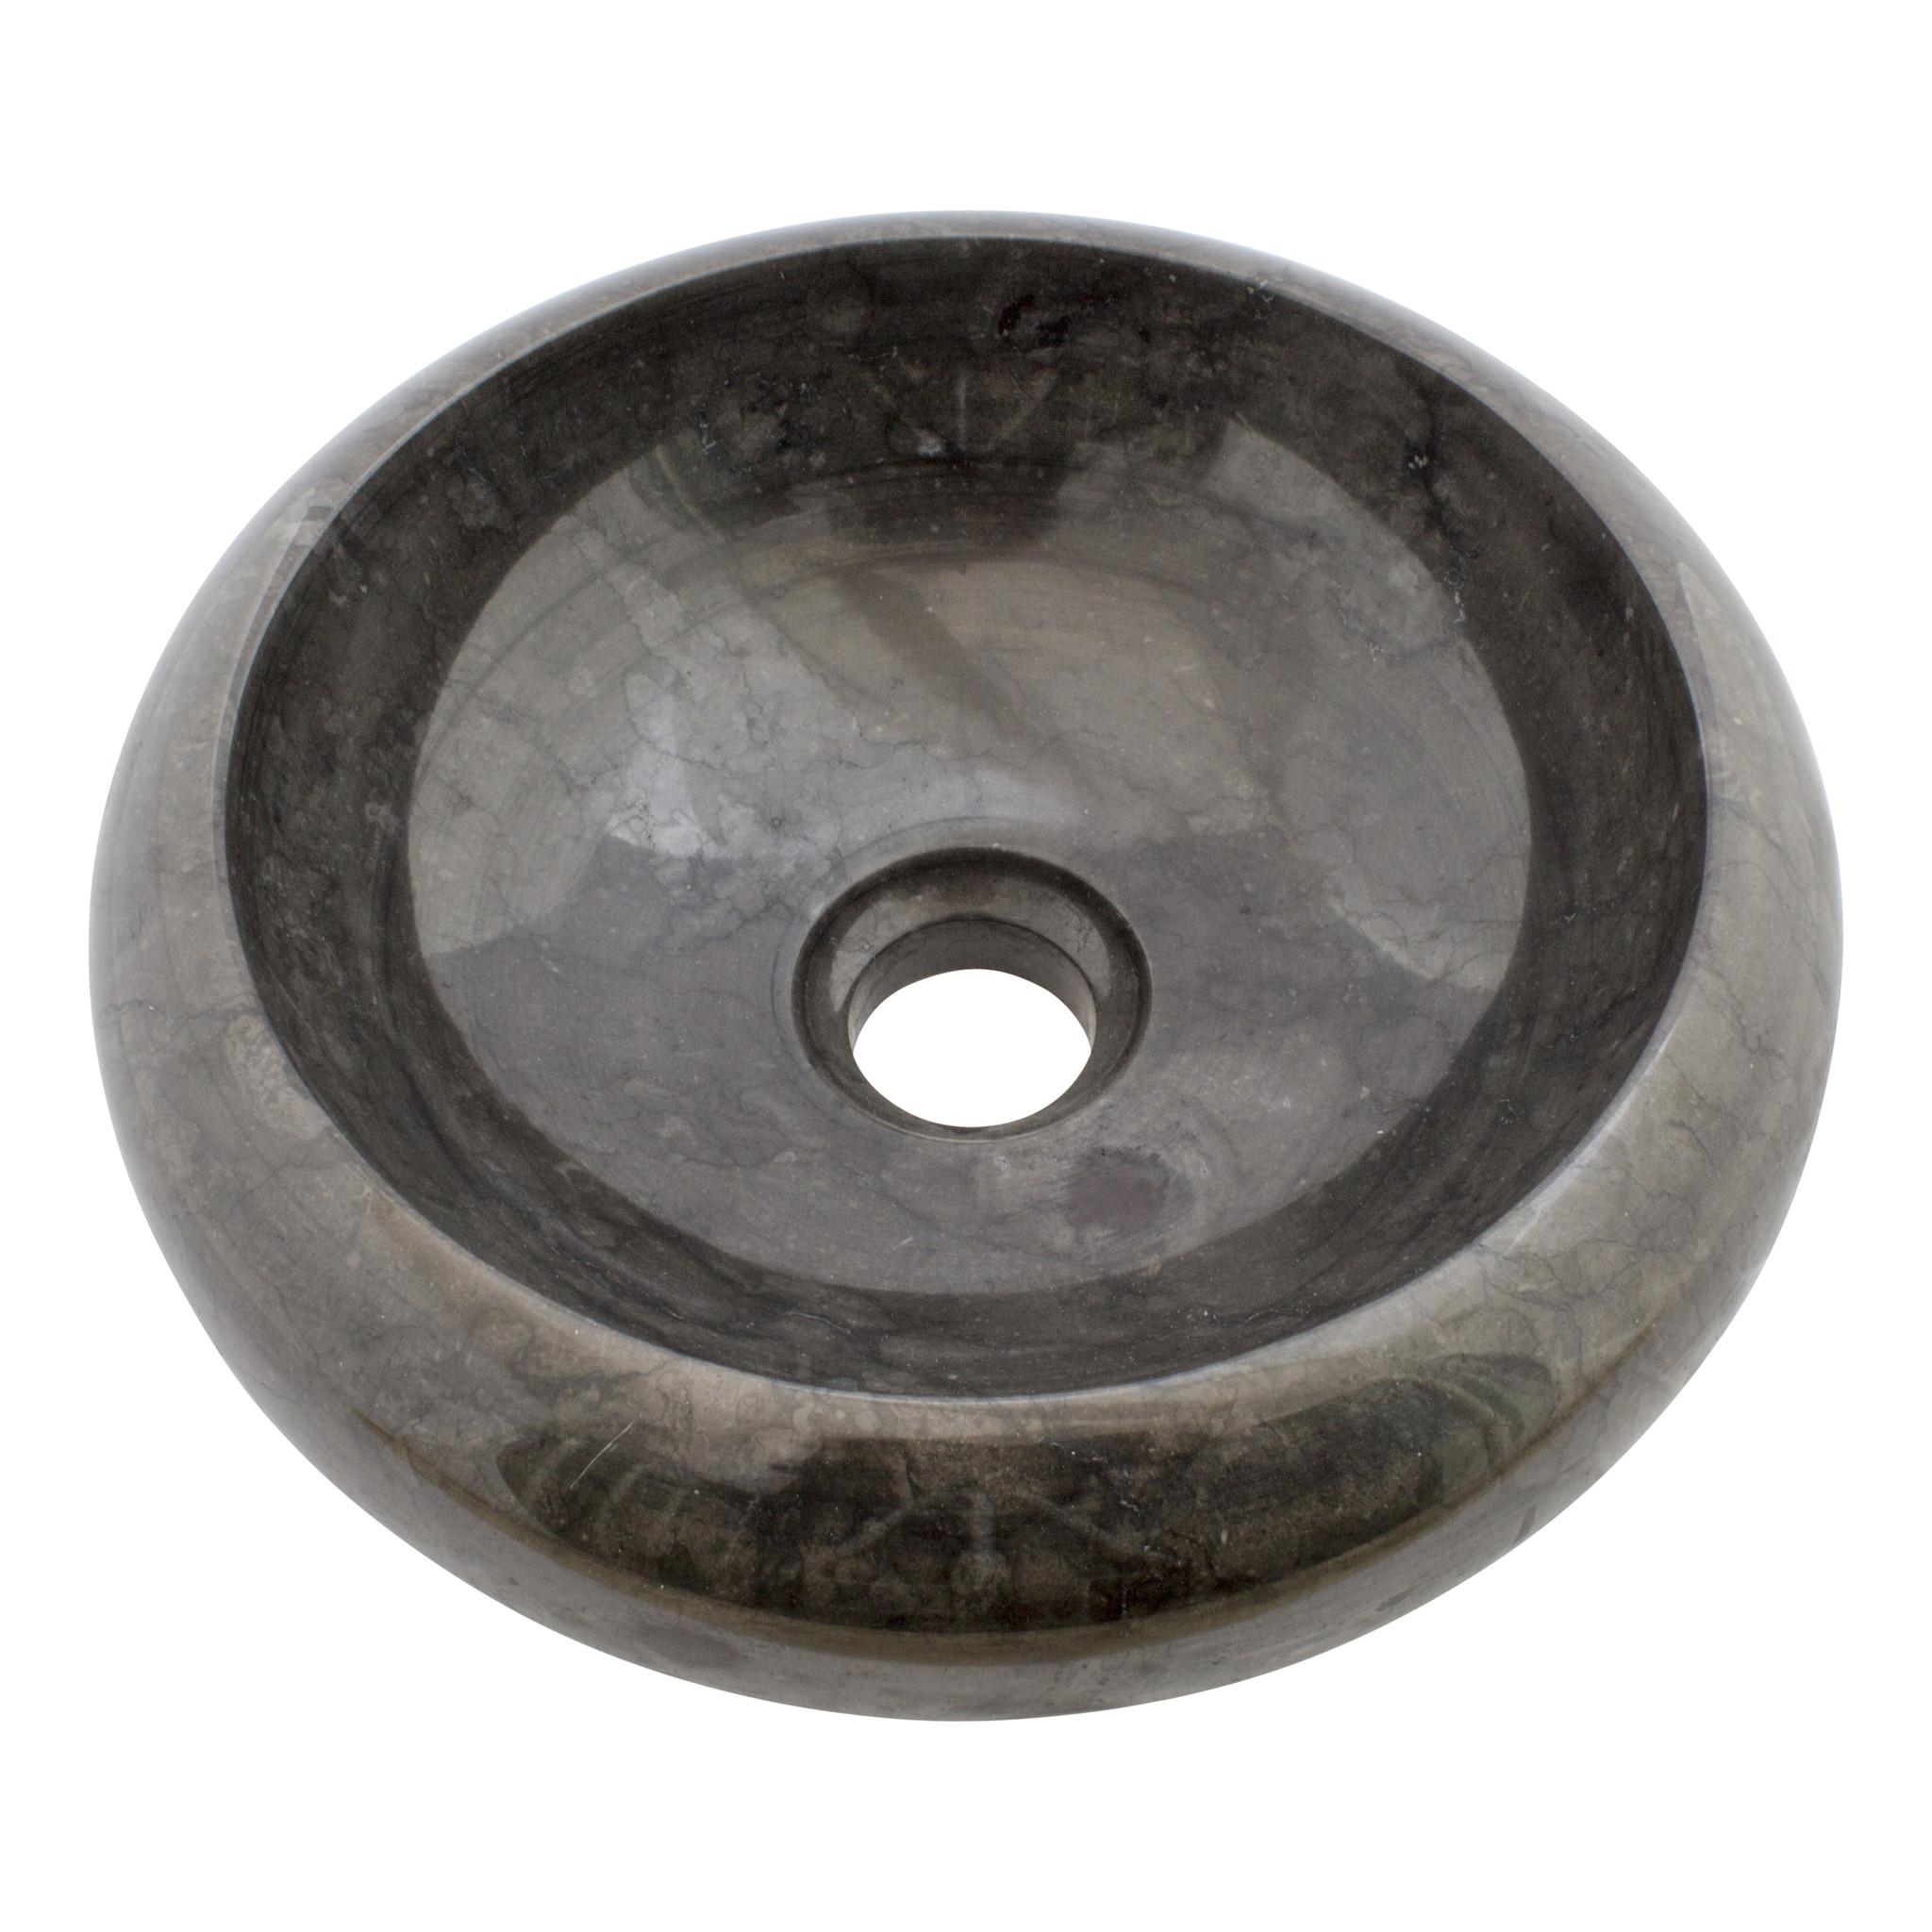 Indomarmer Waskom Donut Zwart Marmer Ø 30 x H 10 cm